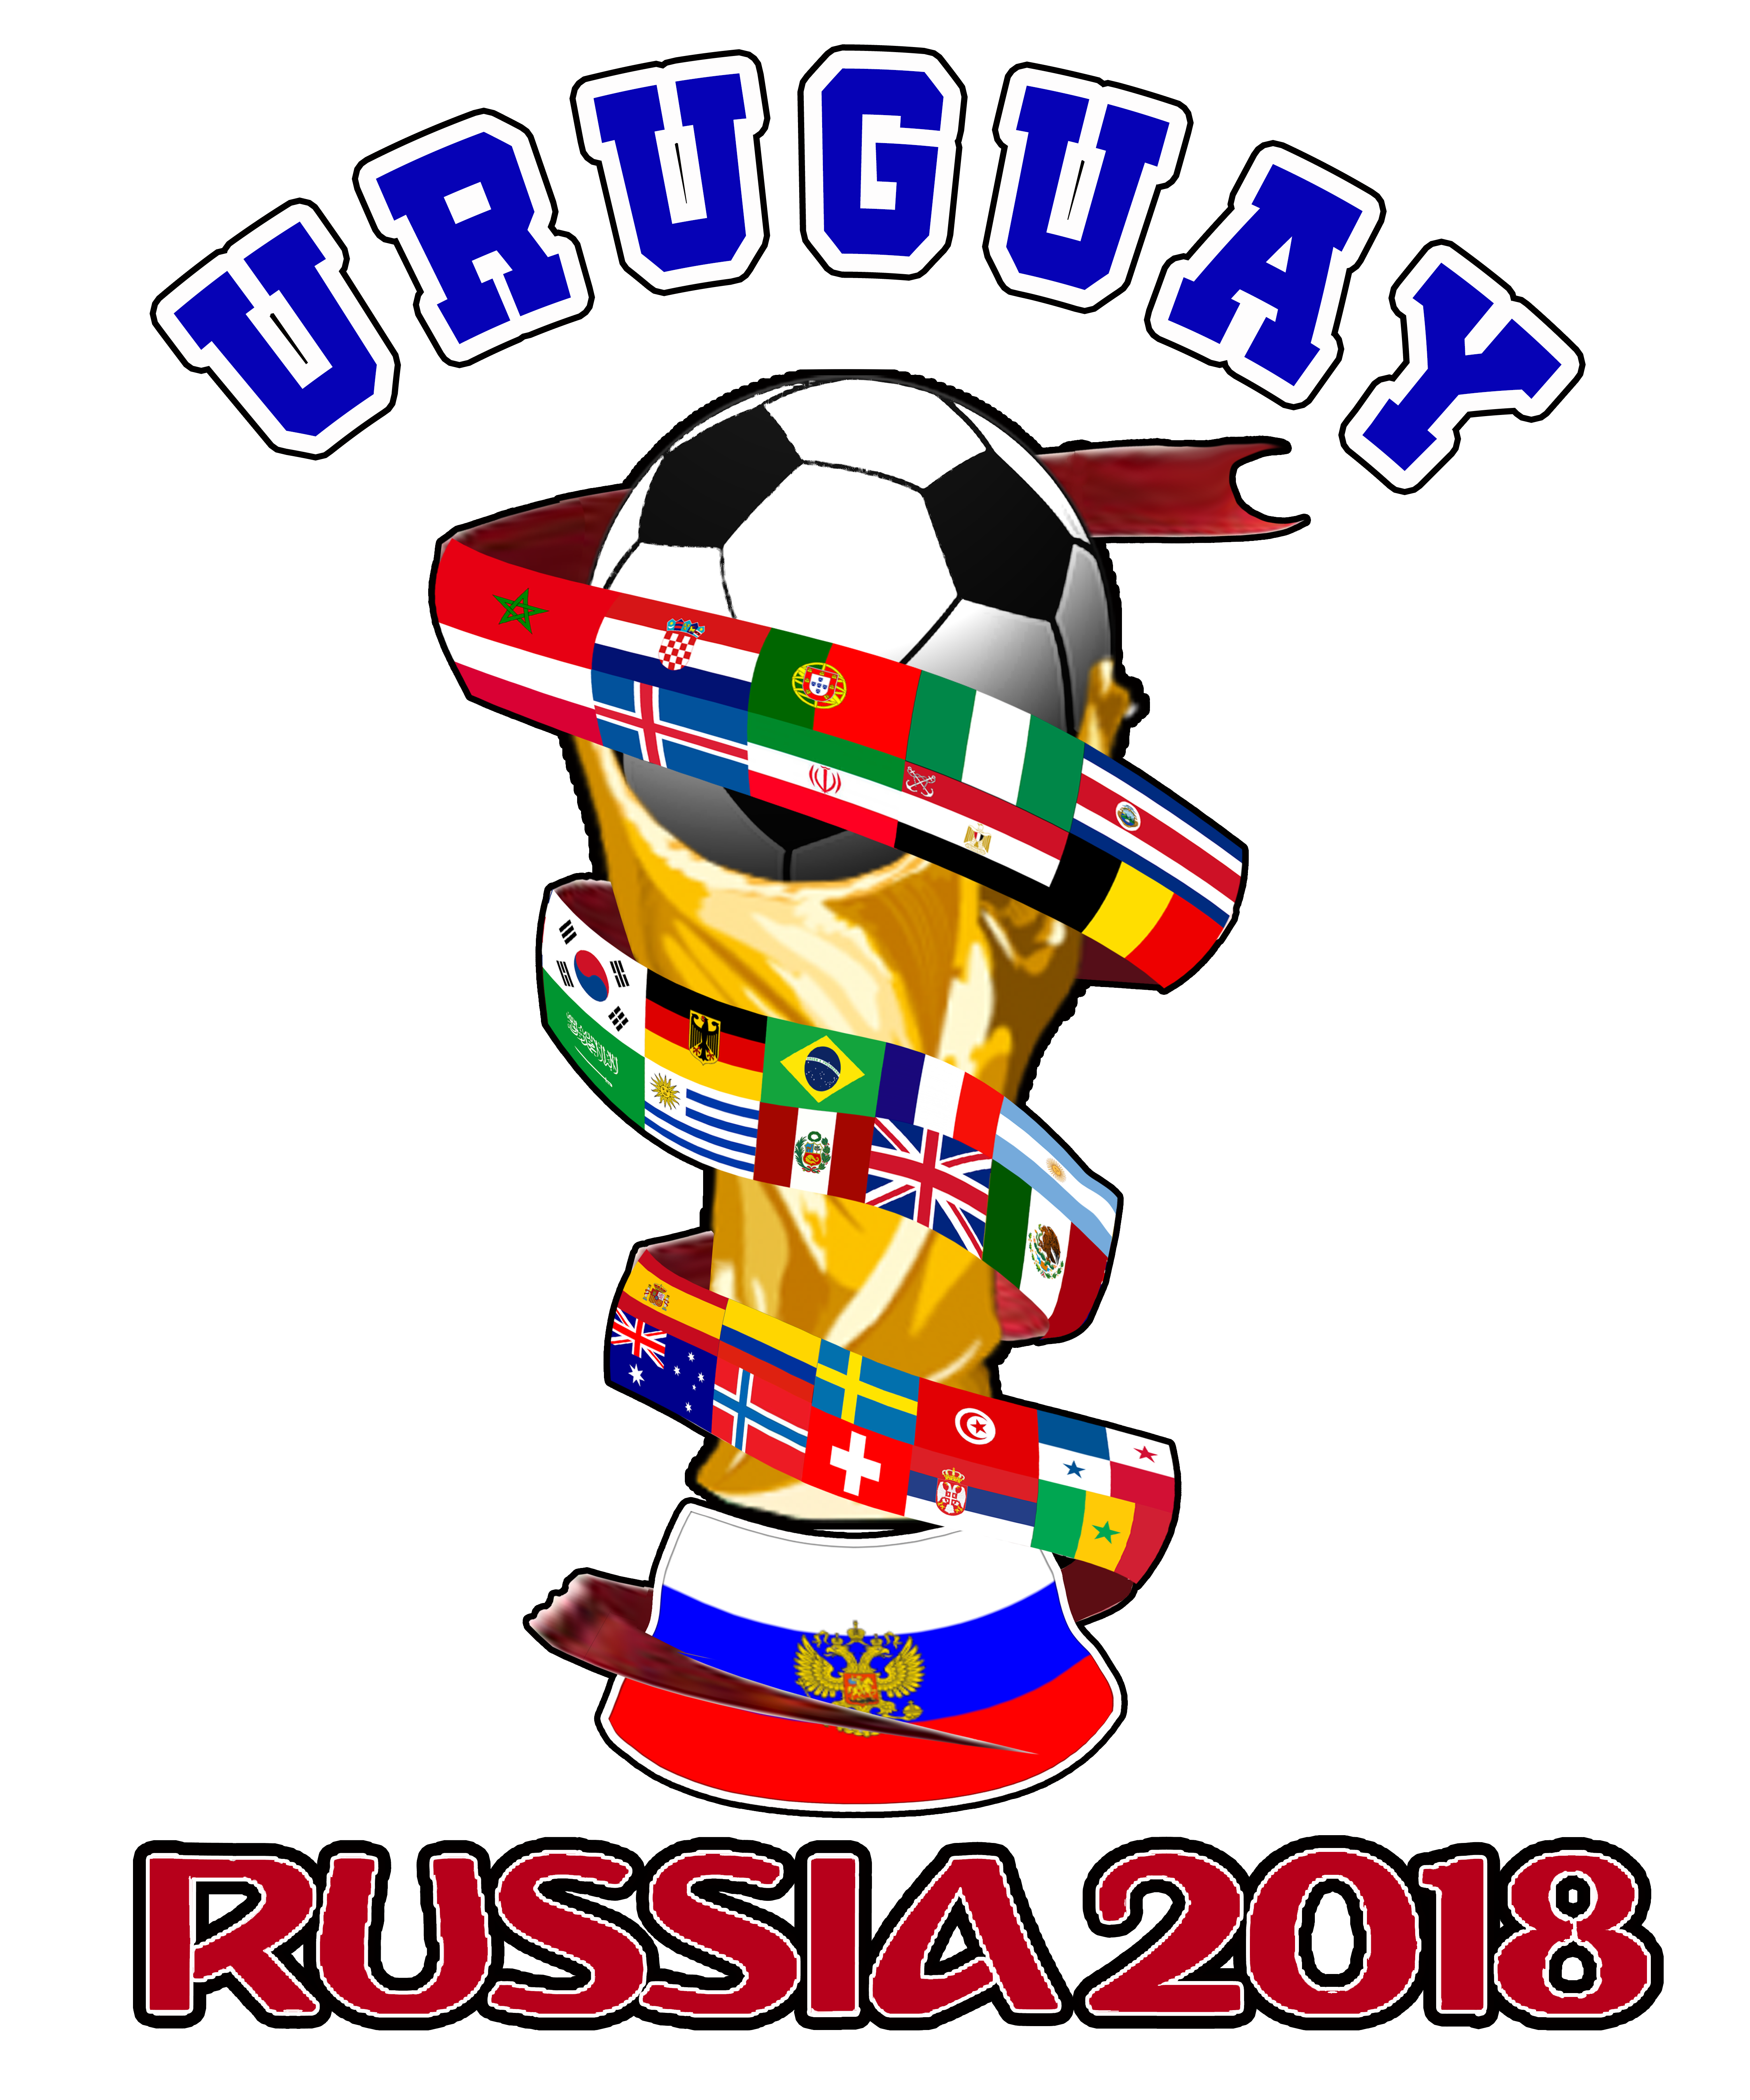 URUGUAY WORLD CUP RUSSIA 2018  00a79d4f2